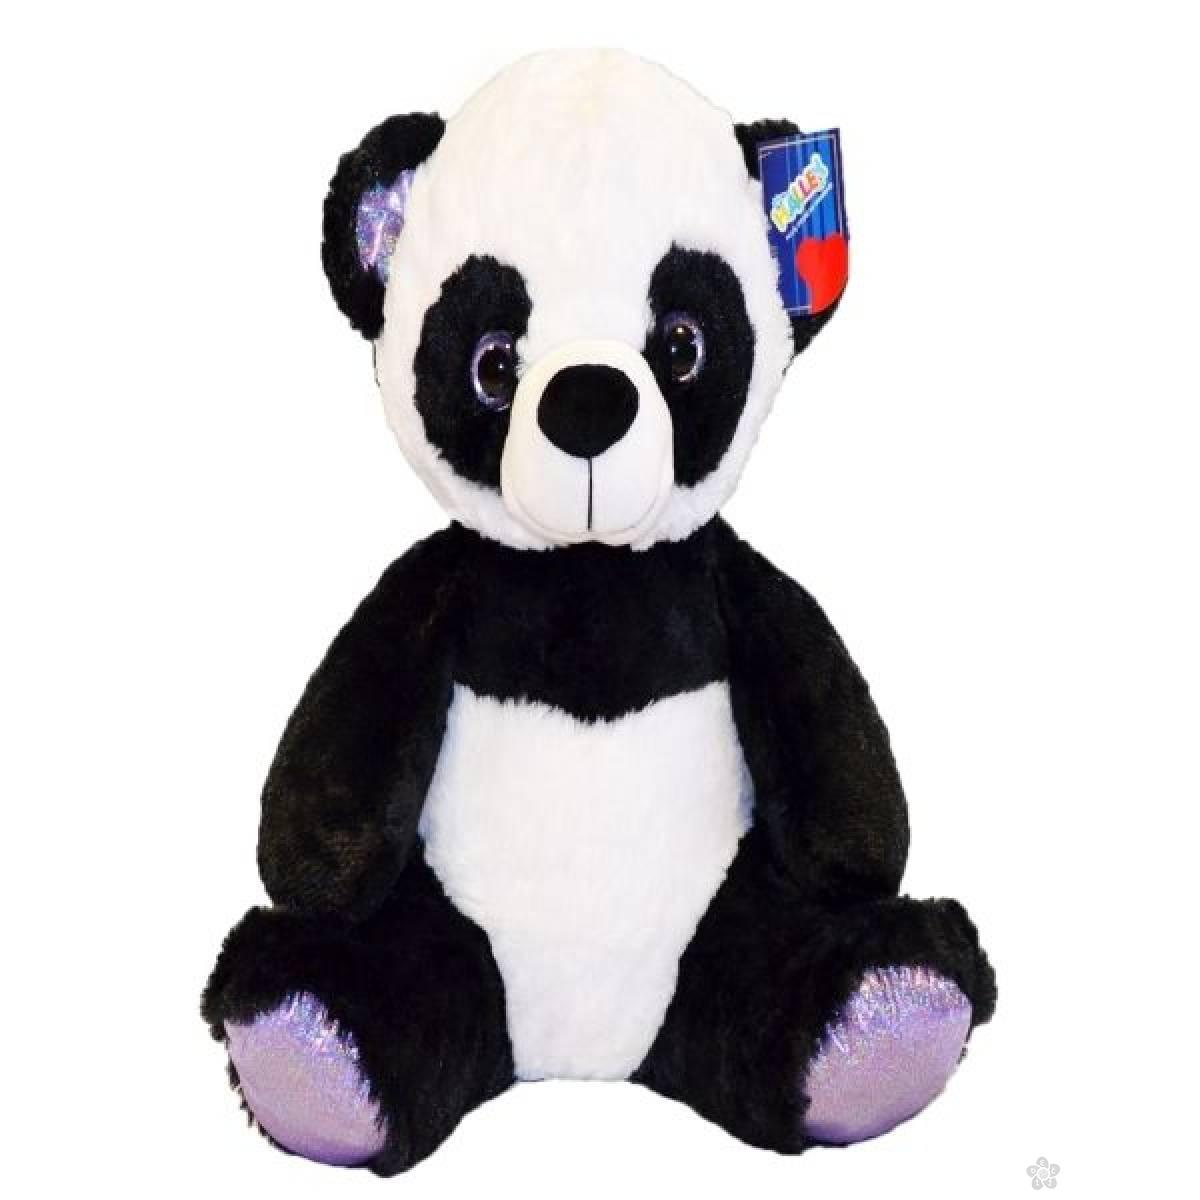 Plišani panda 45cm 11/78707